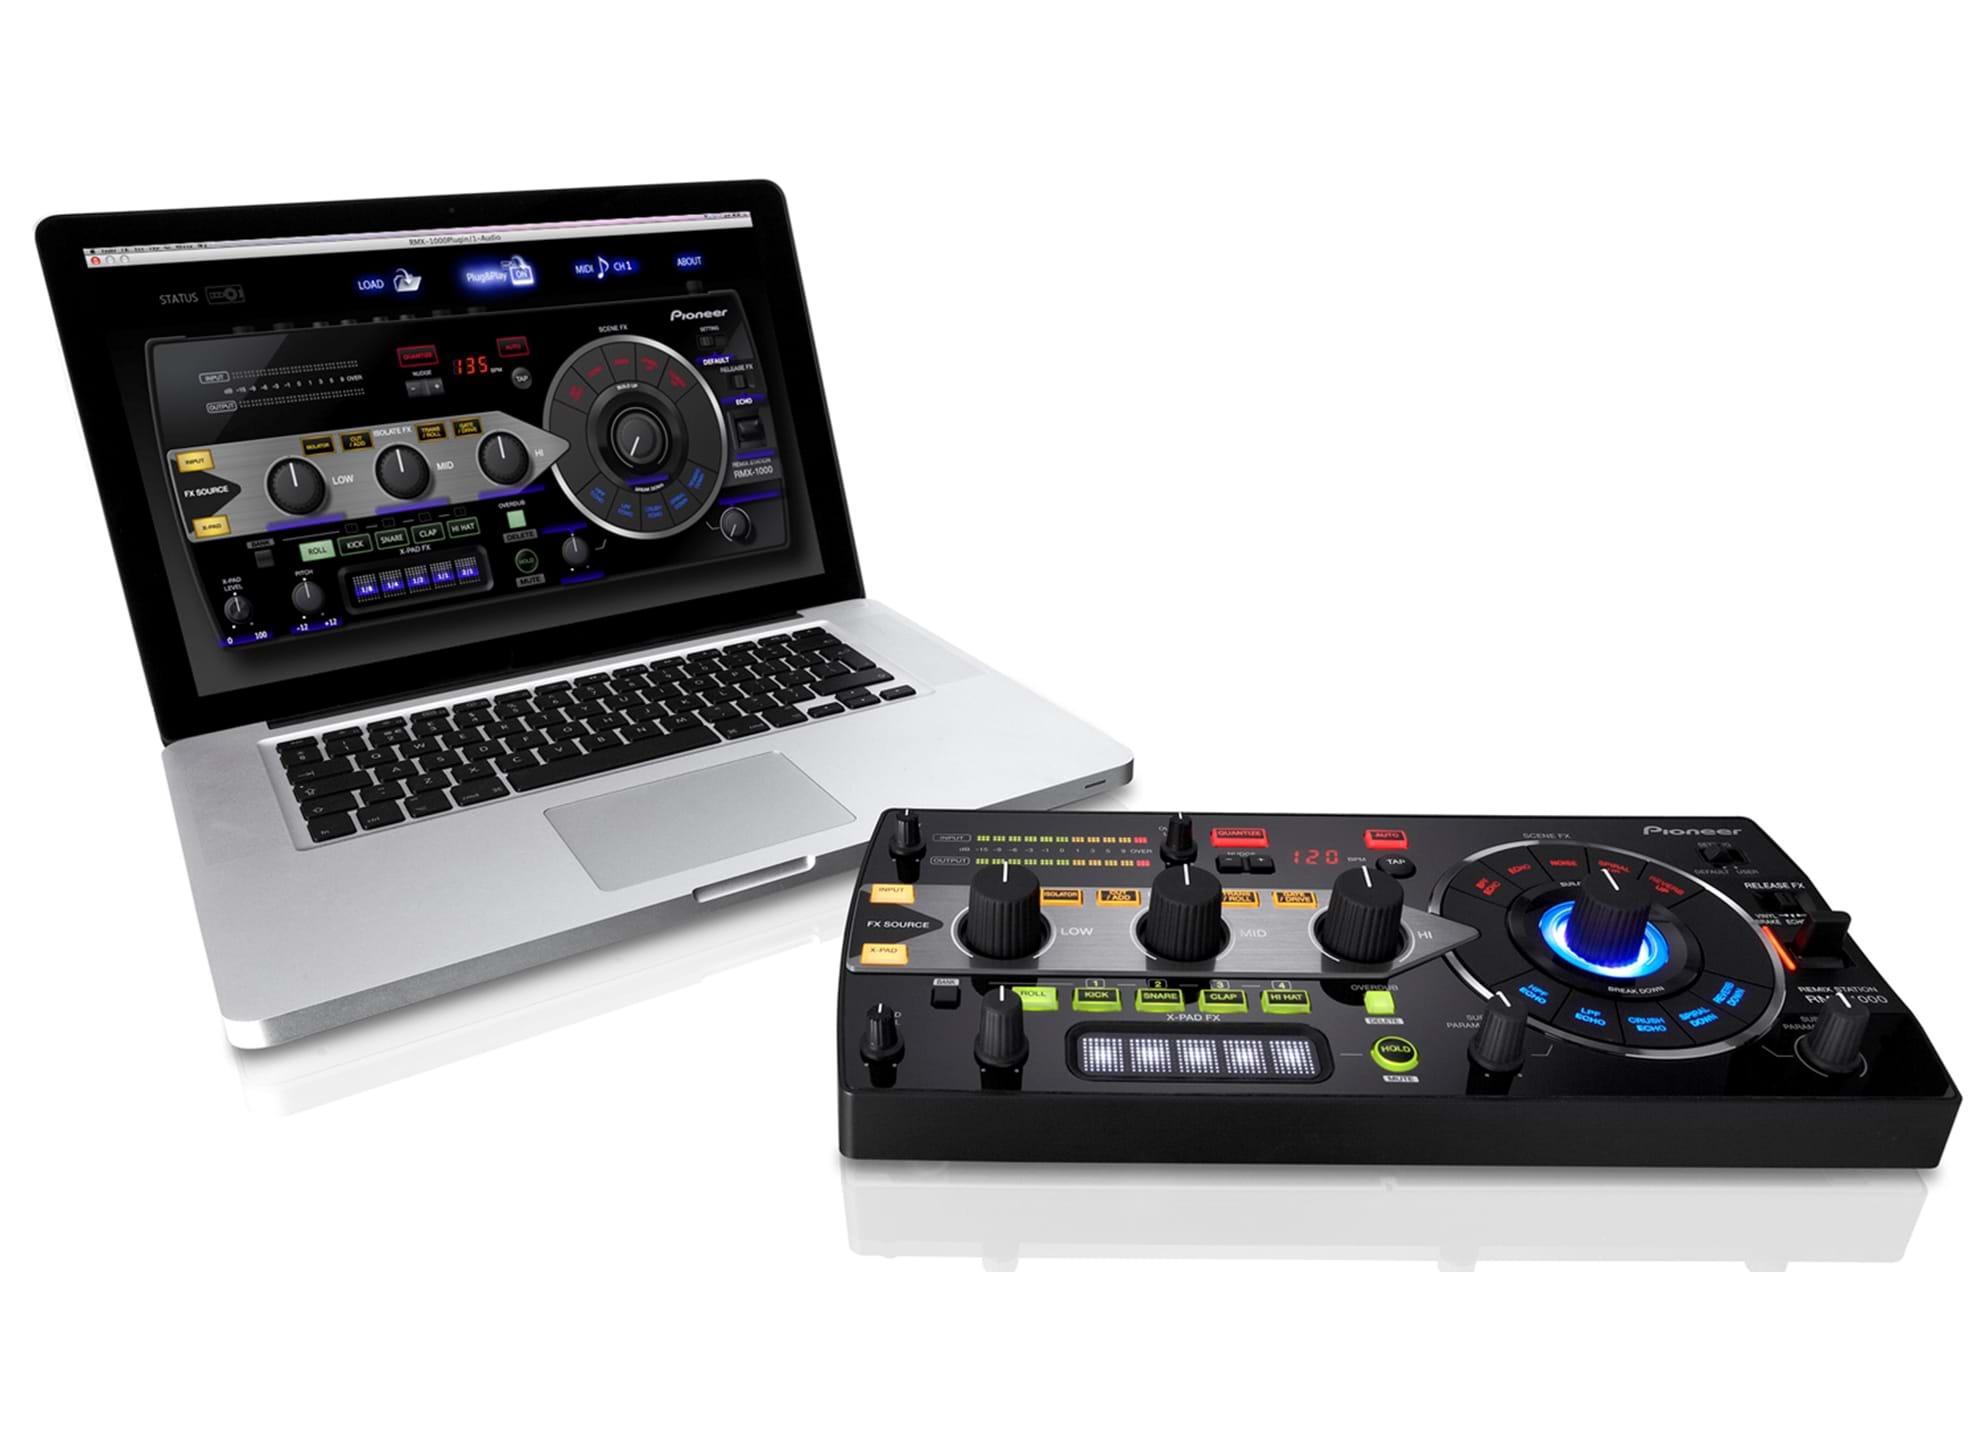 RMX-1000 Remix Station